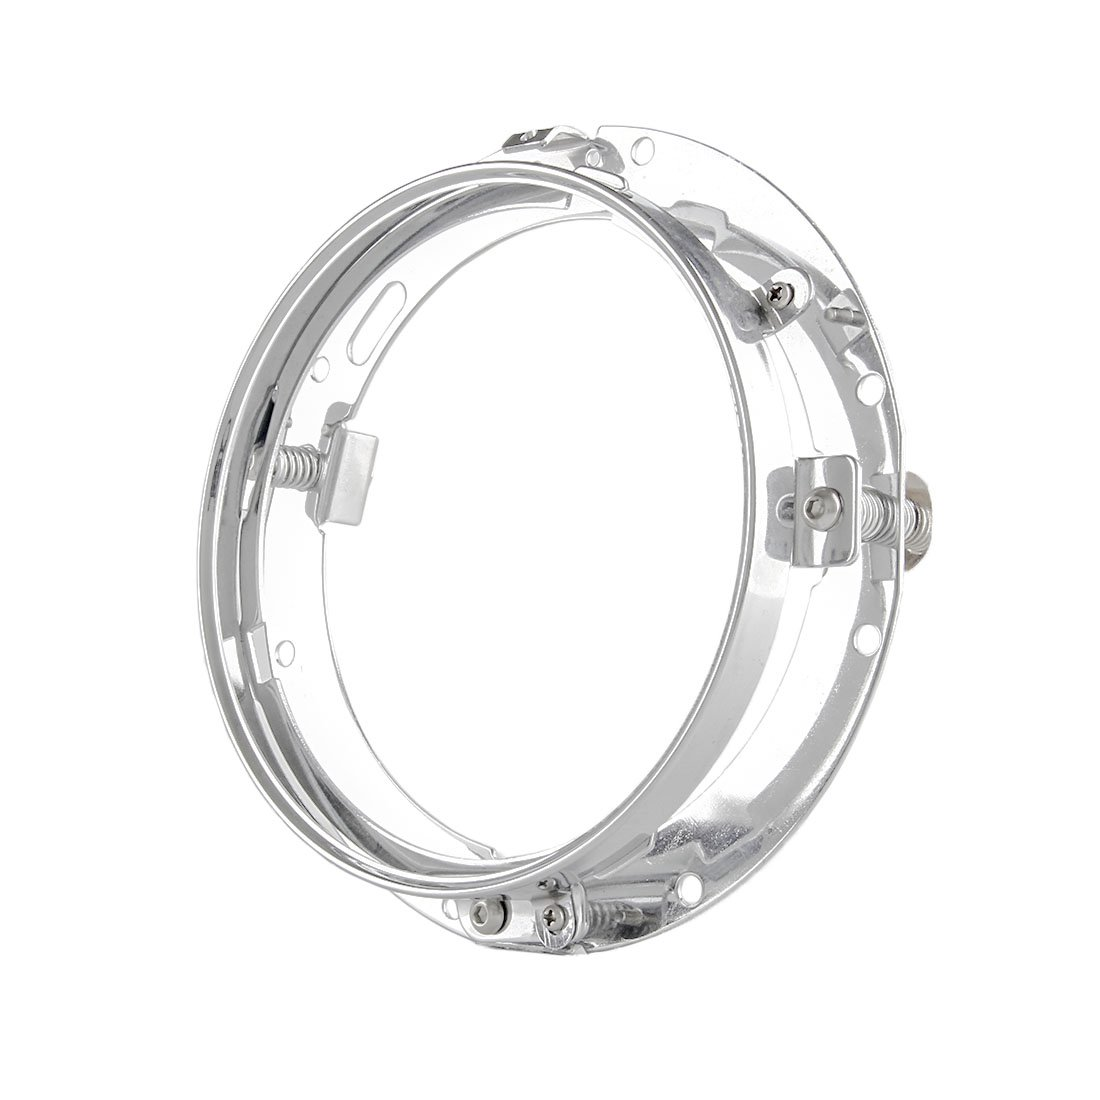 7 inch Round LED Daymaker Projector Headlight Trim Ring Mounting Bracket for Harley Davidson Headlight//Street Glide Black